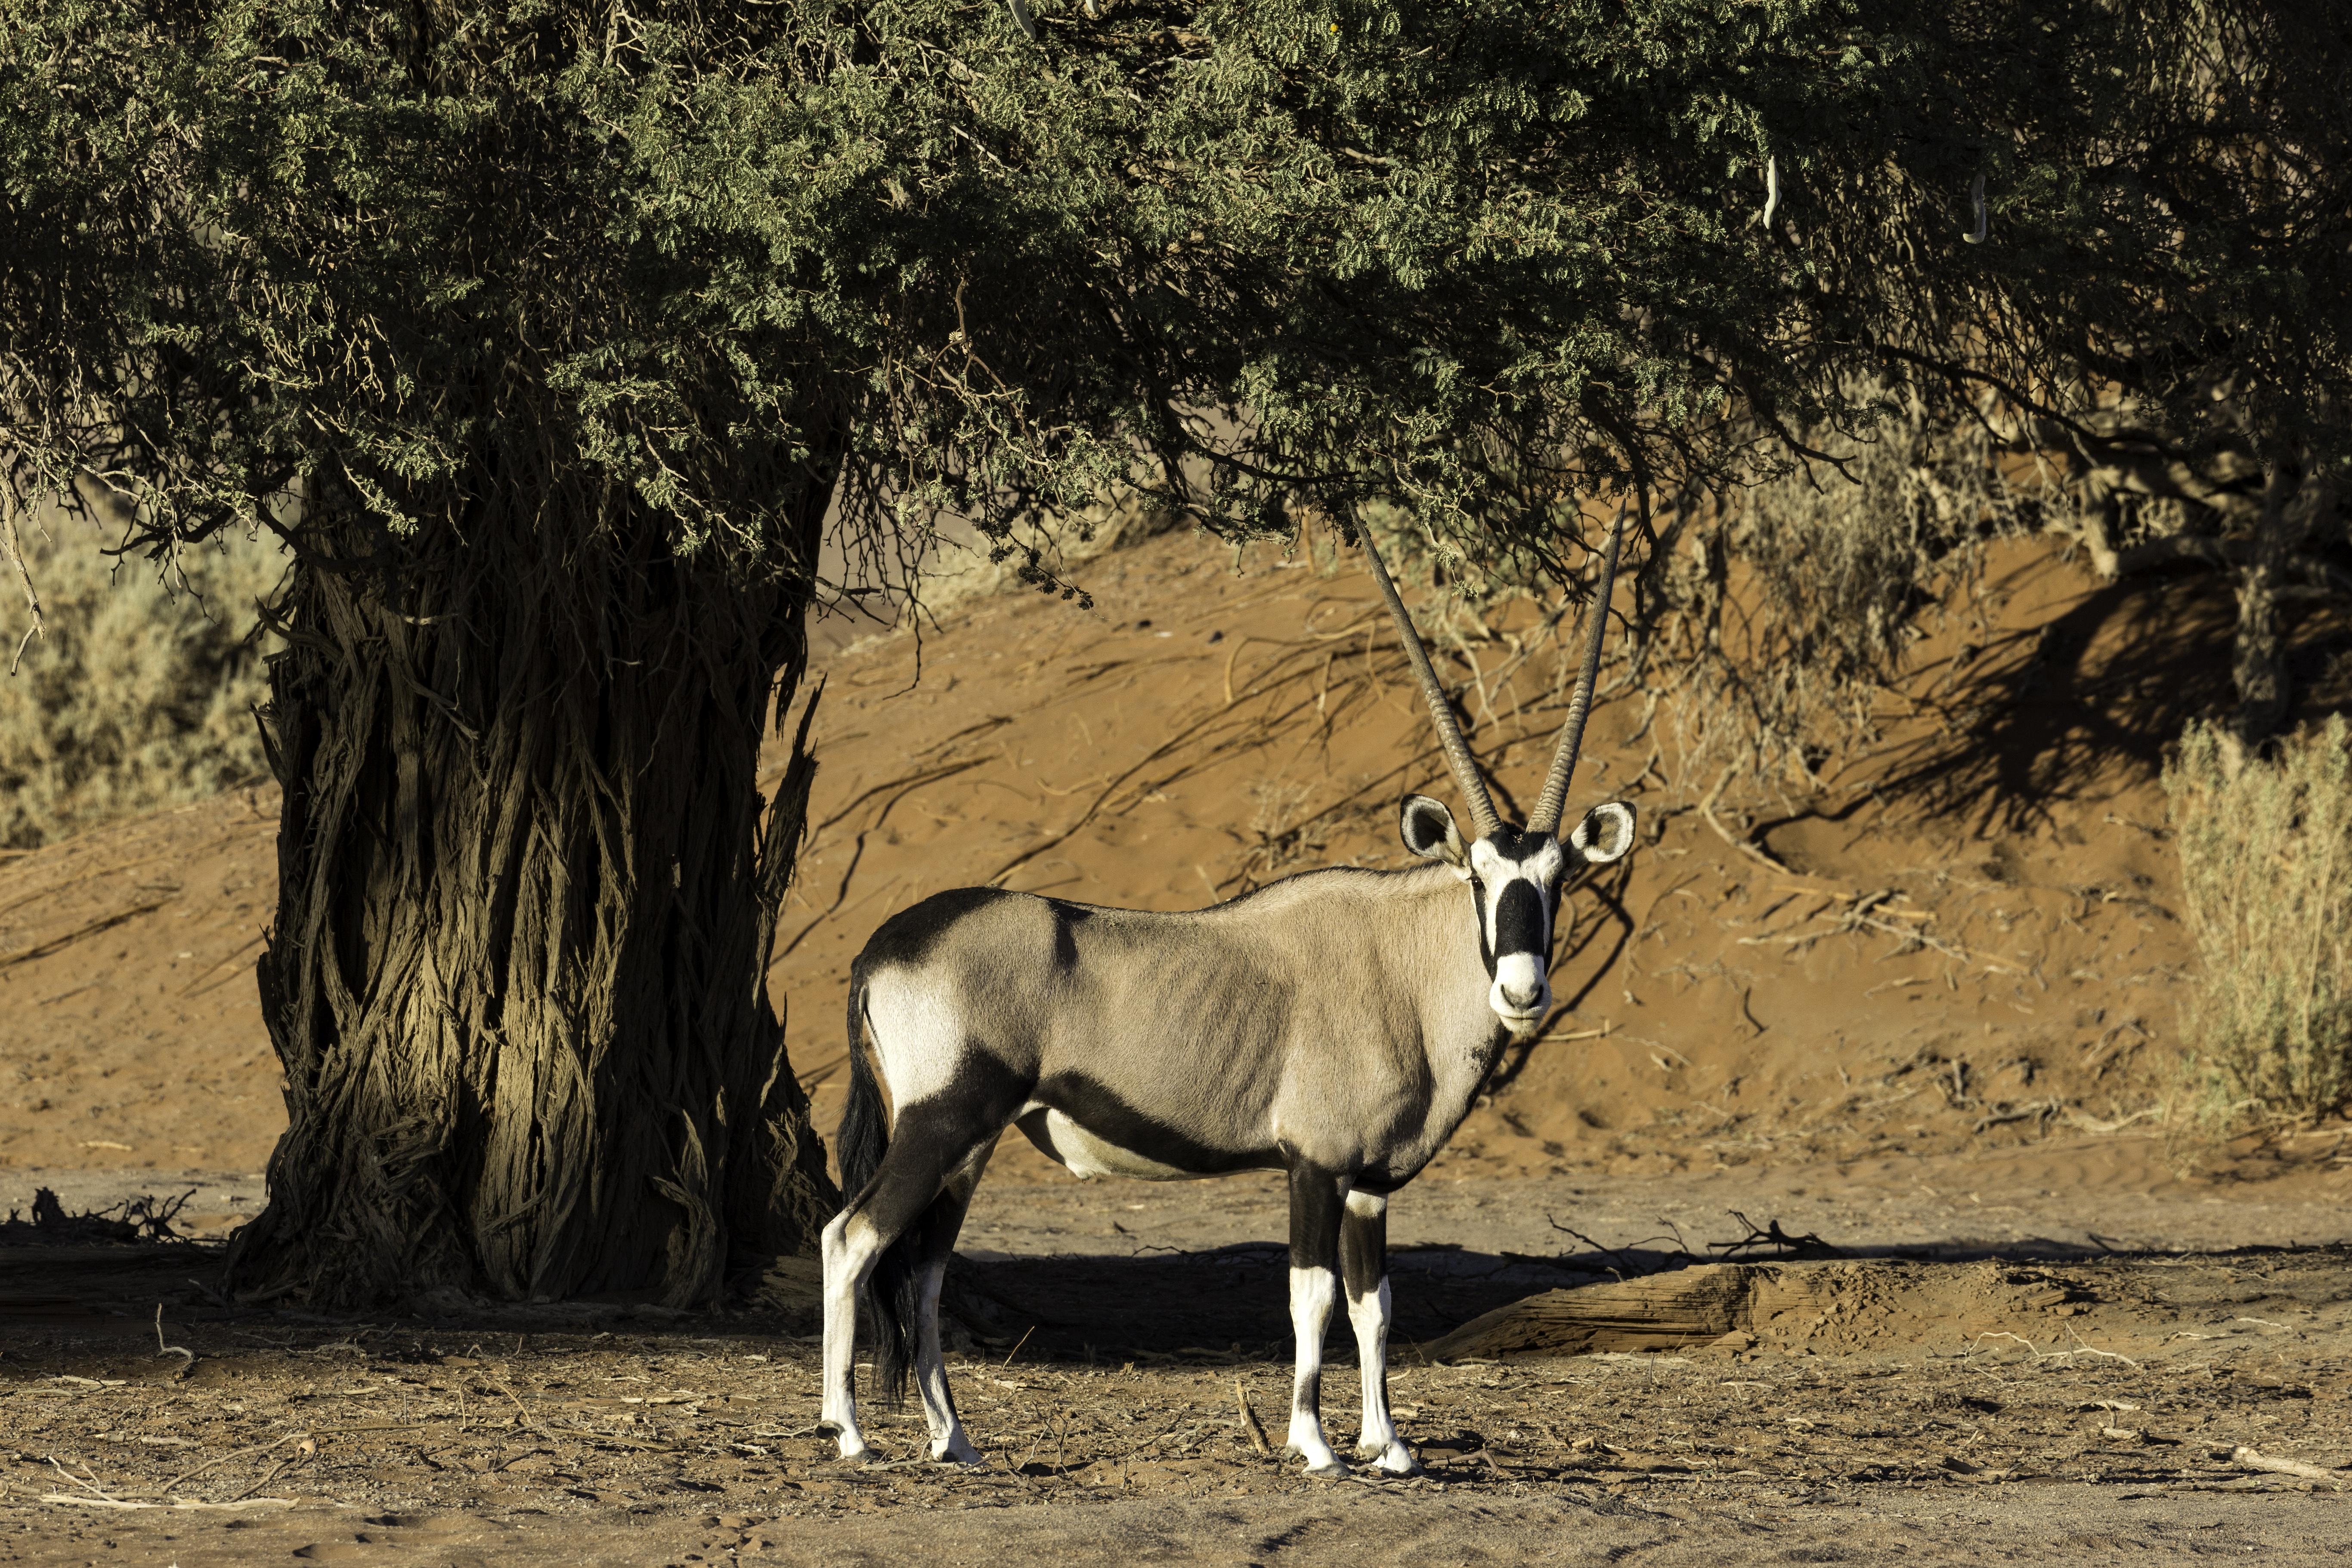 Soussusvlei oryx